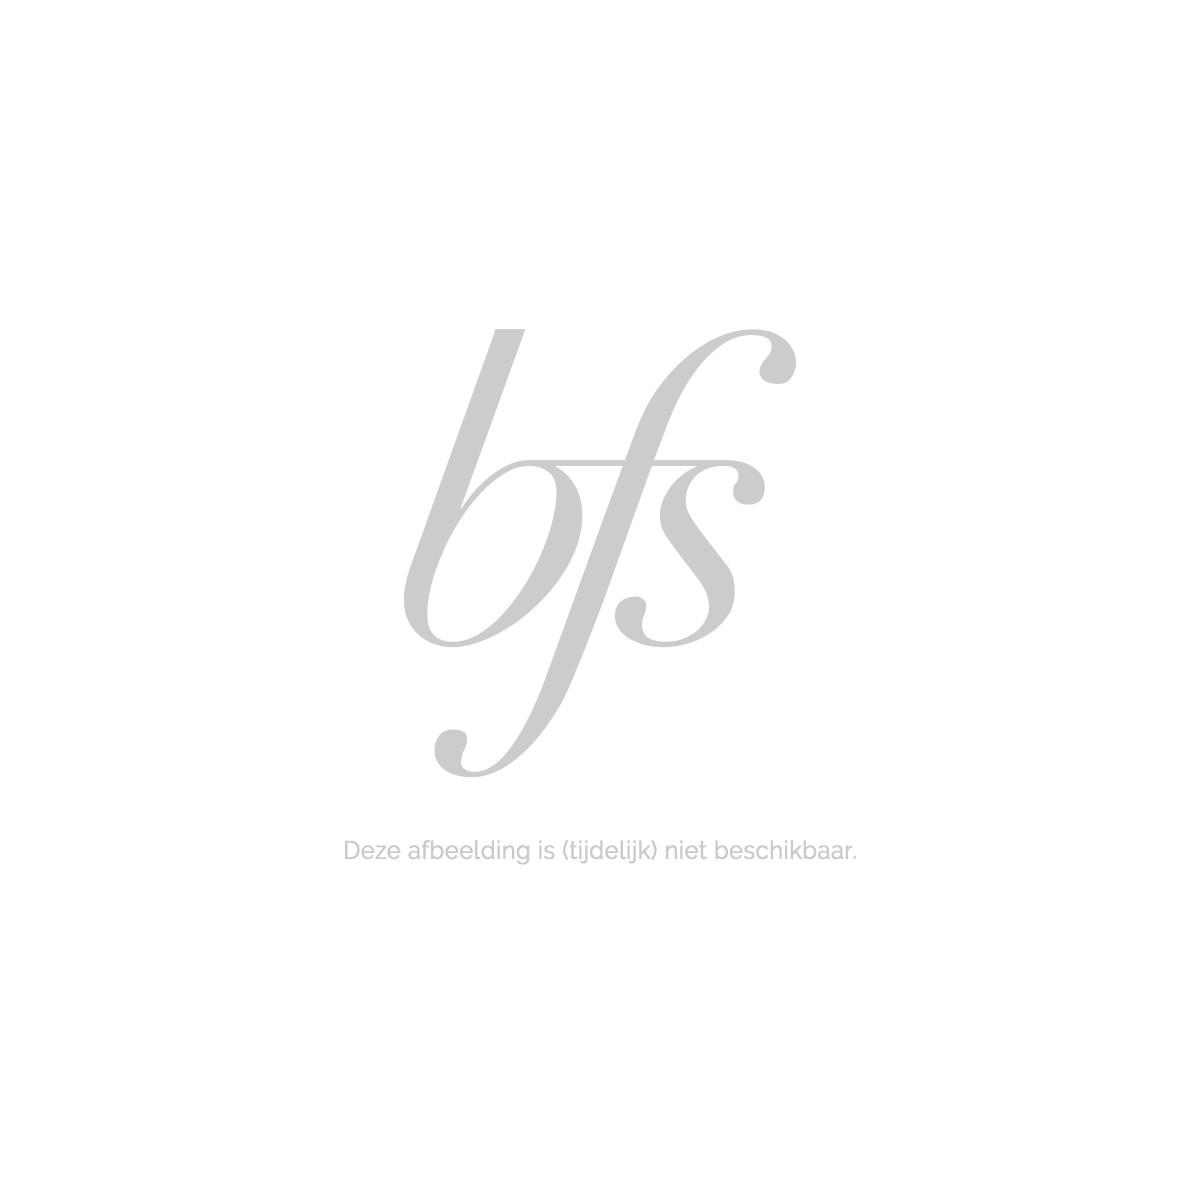 J.P. Gaultier Classique Body Lotion Perfumed 200 Ml